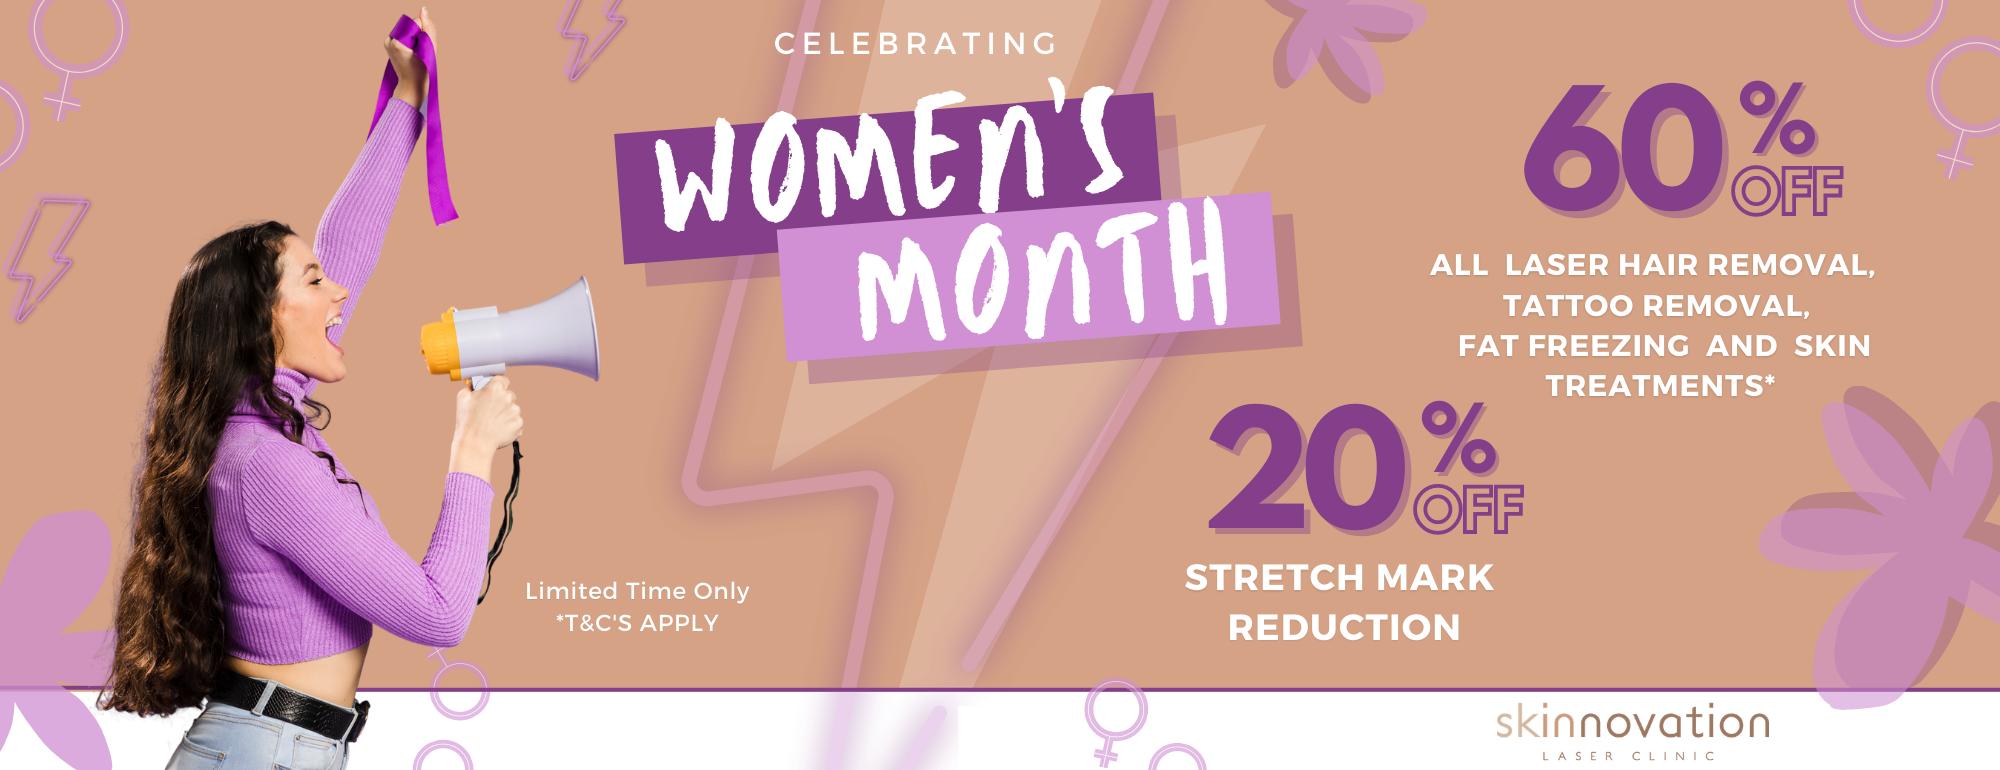 BANNER SITE Women's month